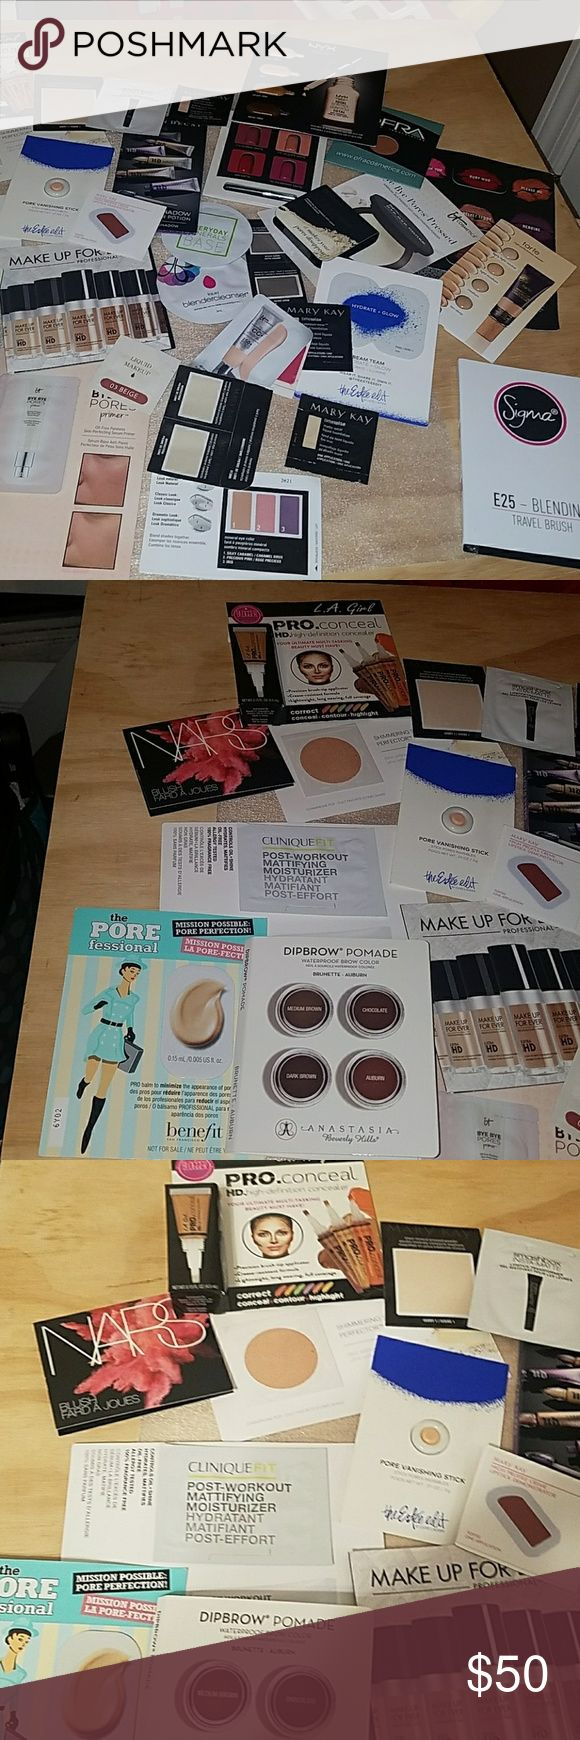 AssortedLarge HighEnd MakeupSamples! Large 32 High End Makeup Samples  Bundle ! One Is a travel makeup brush Open  to Offers! Makeup